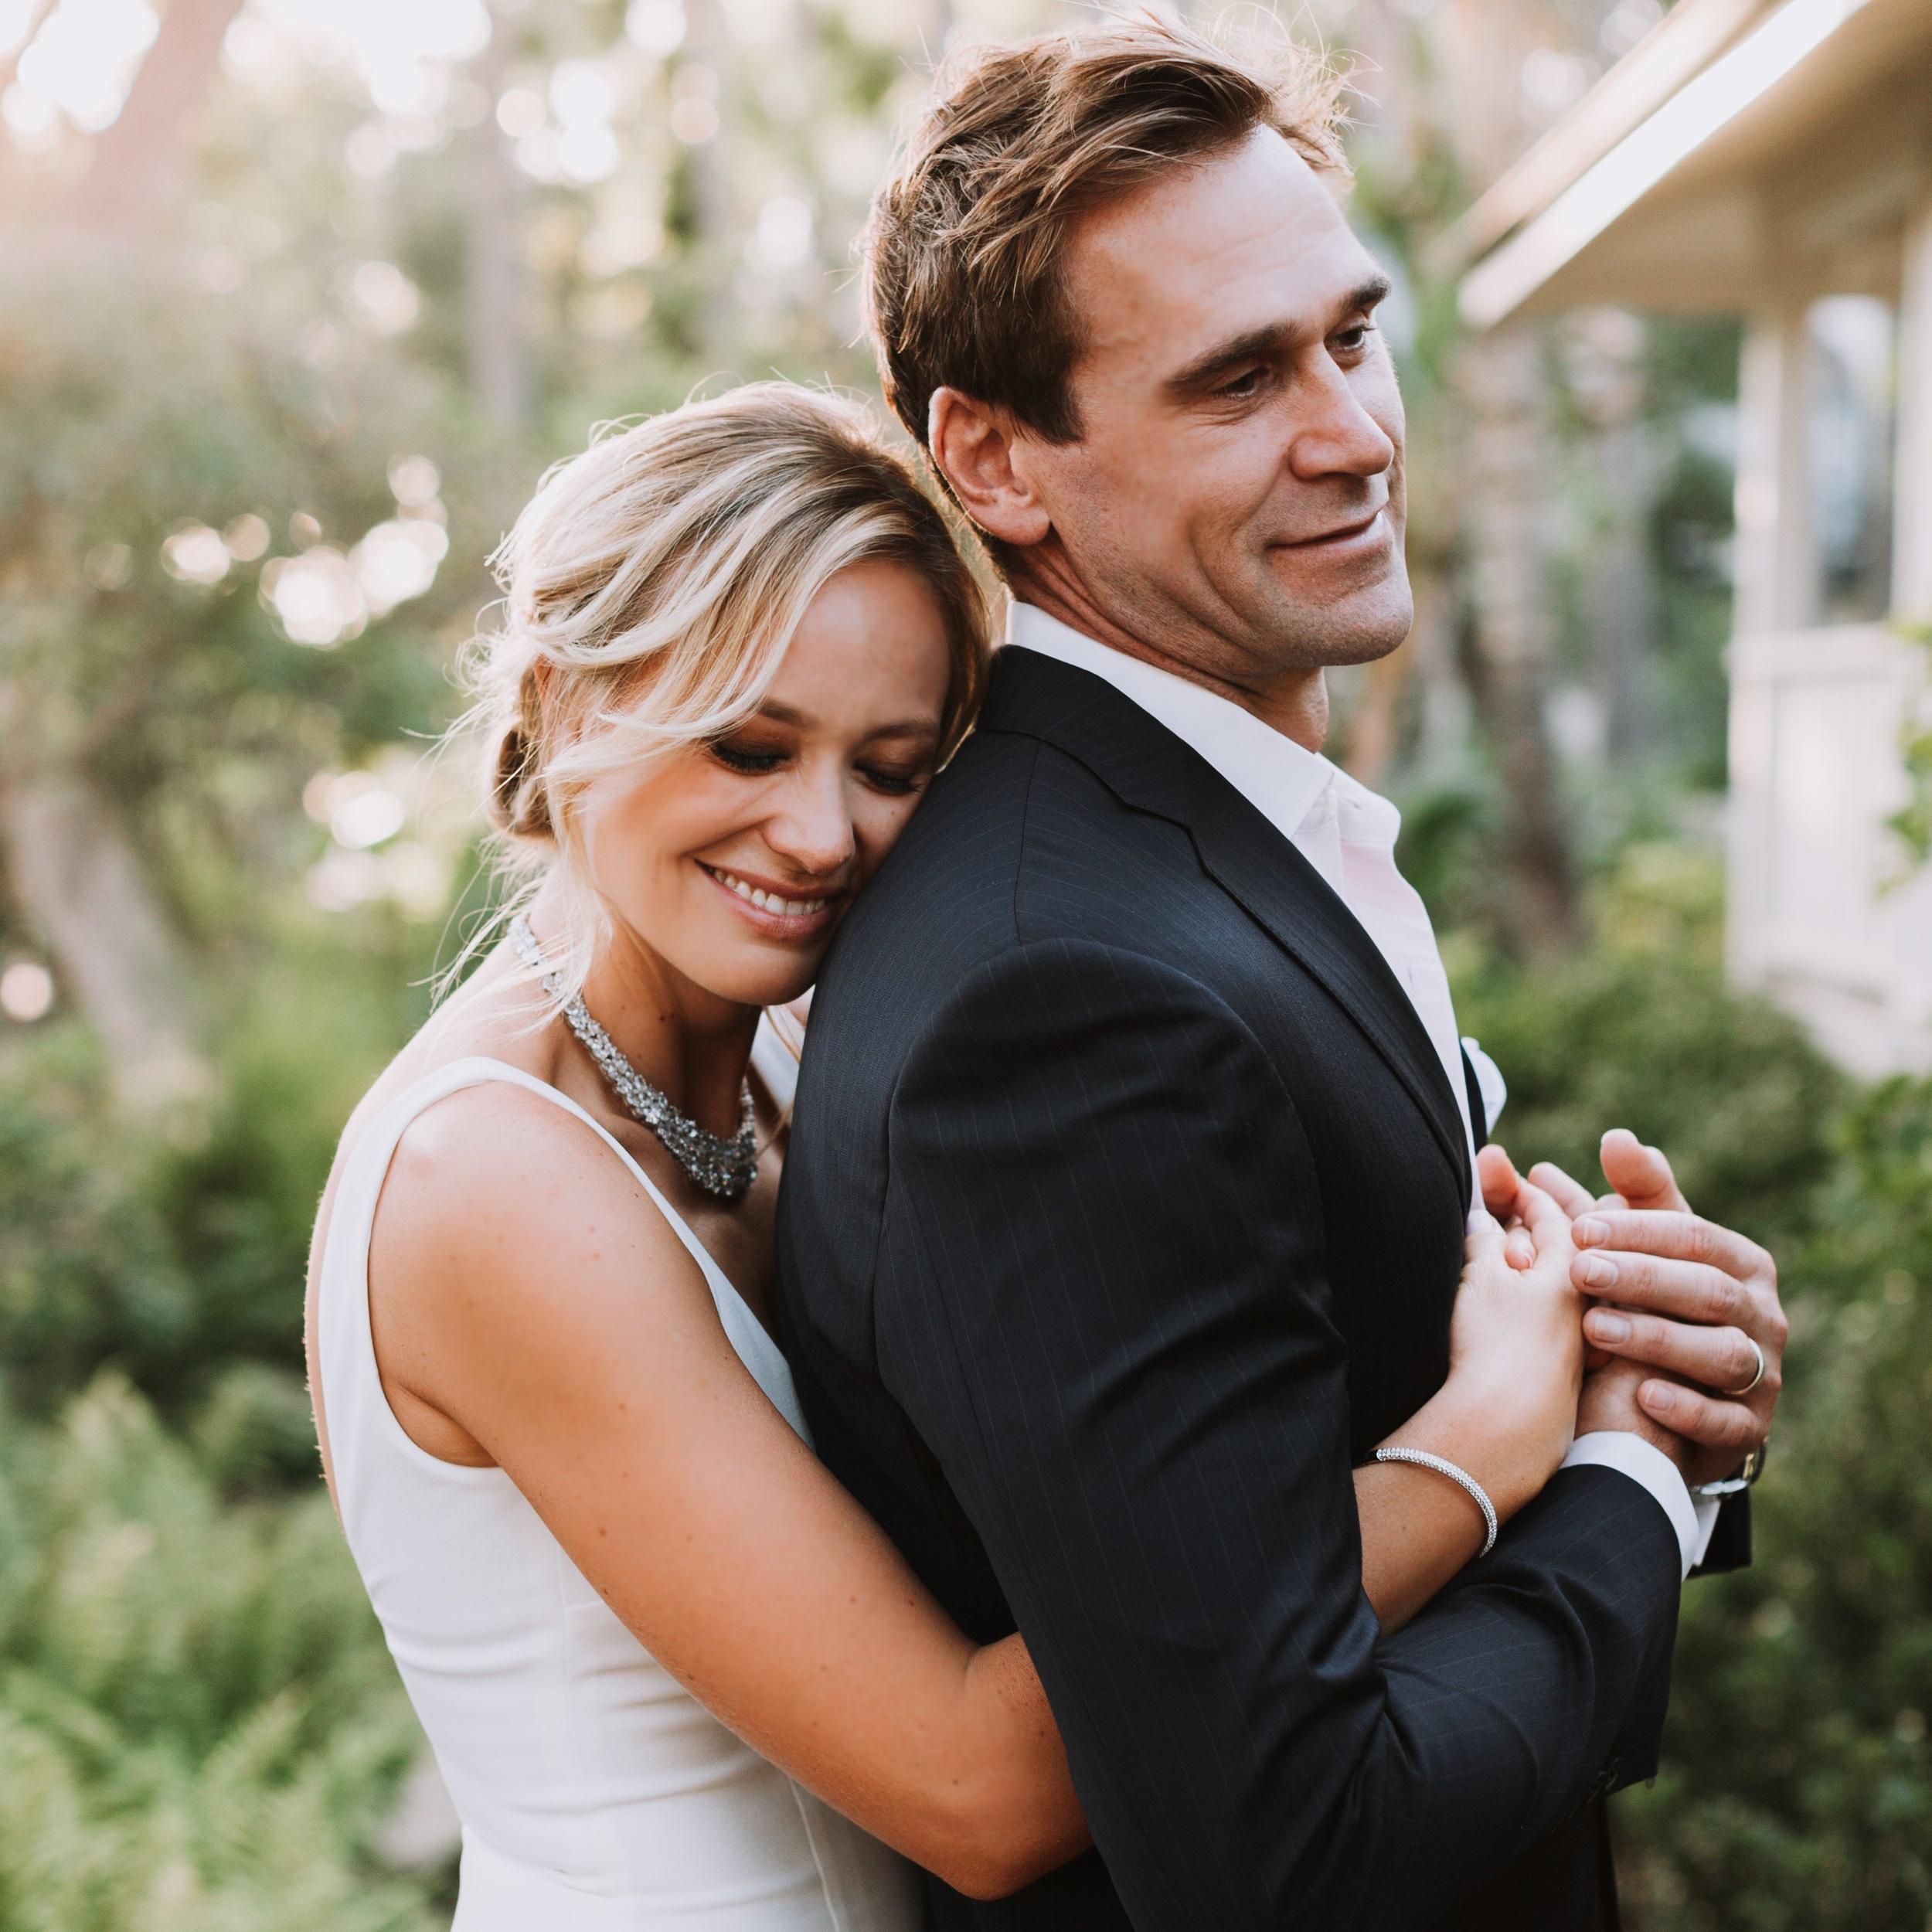 Kerry + Luke | Vow Renewal | Santa Barbara, CA